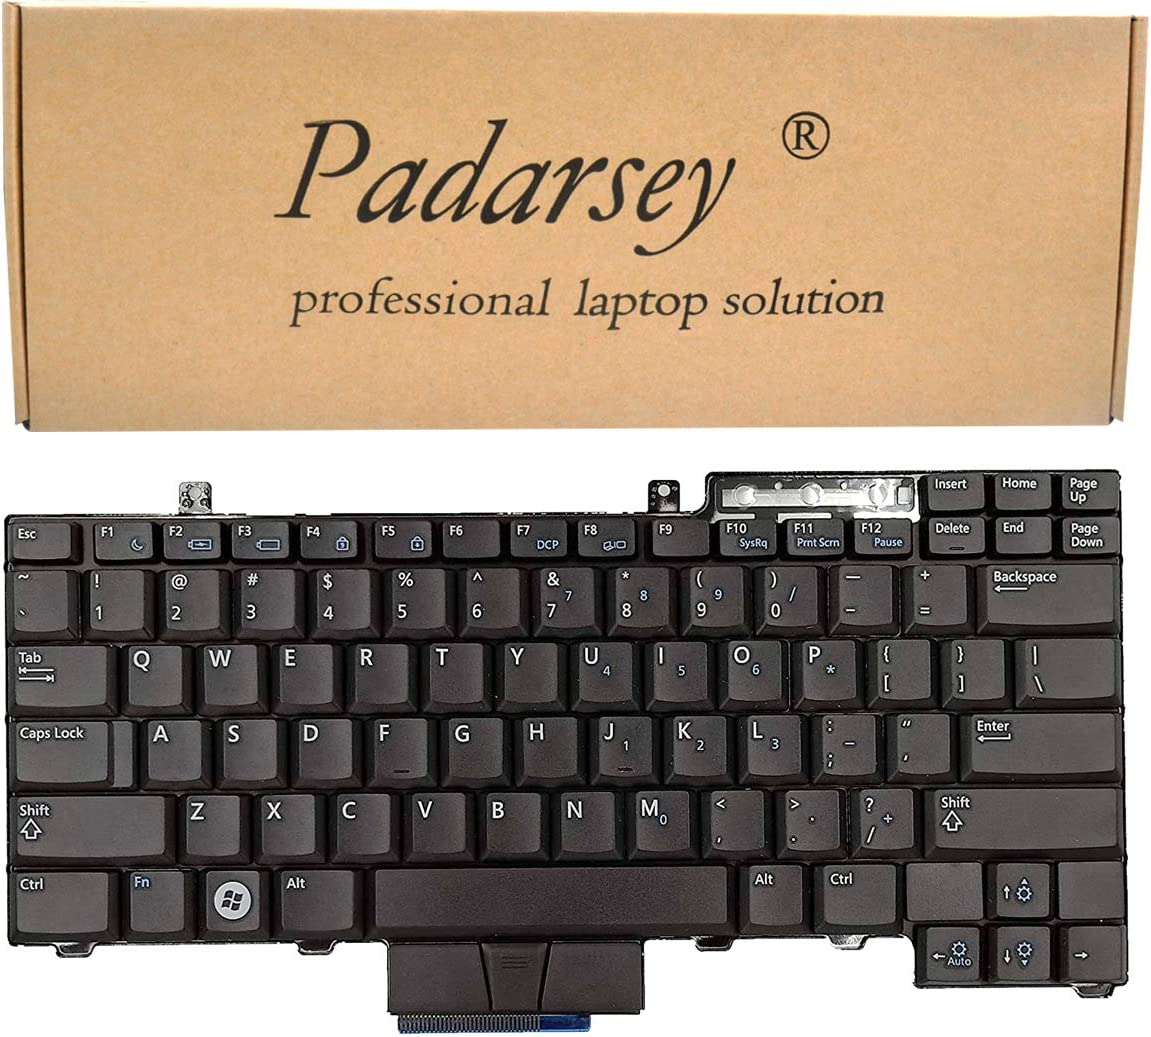 Padarsey Replacement Keyboard Without Pointer Compatible with Dell Latutude E6400 E6410 E6500 E6510 E5410 E5510 E5400 E5500 Precision M2400 M4400 M4500 Series Laptop US Layout